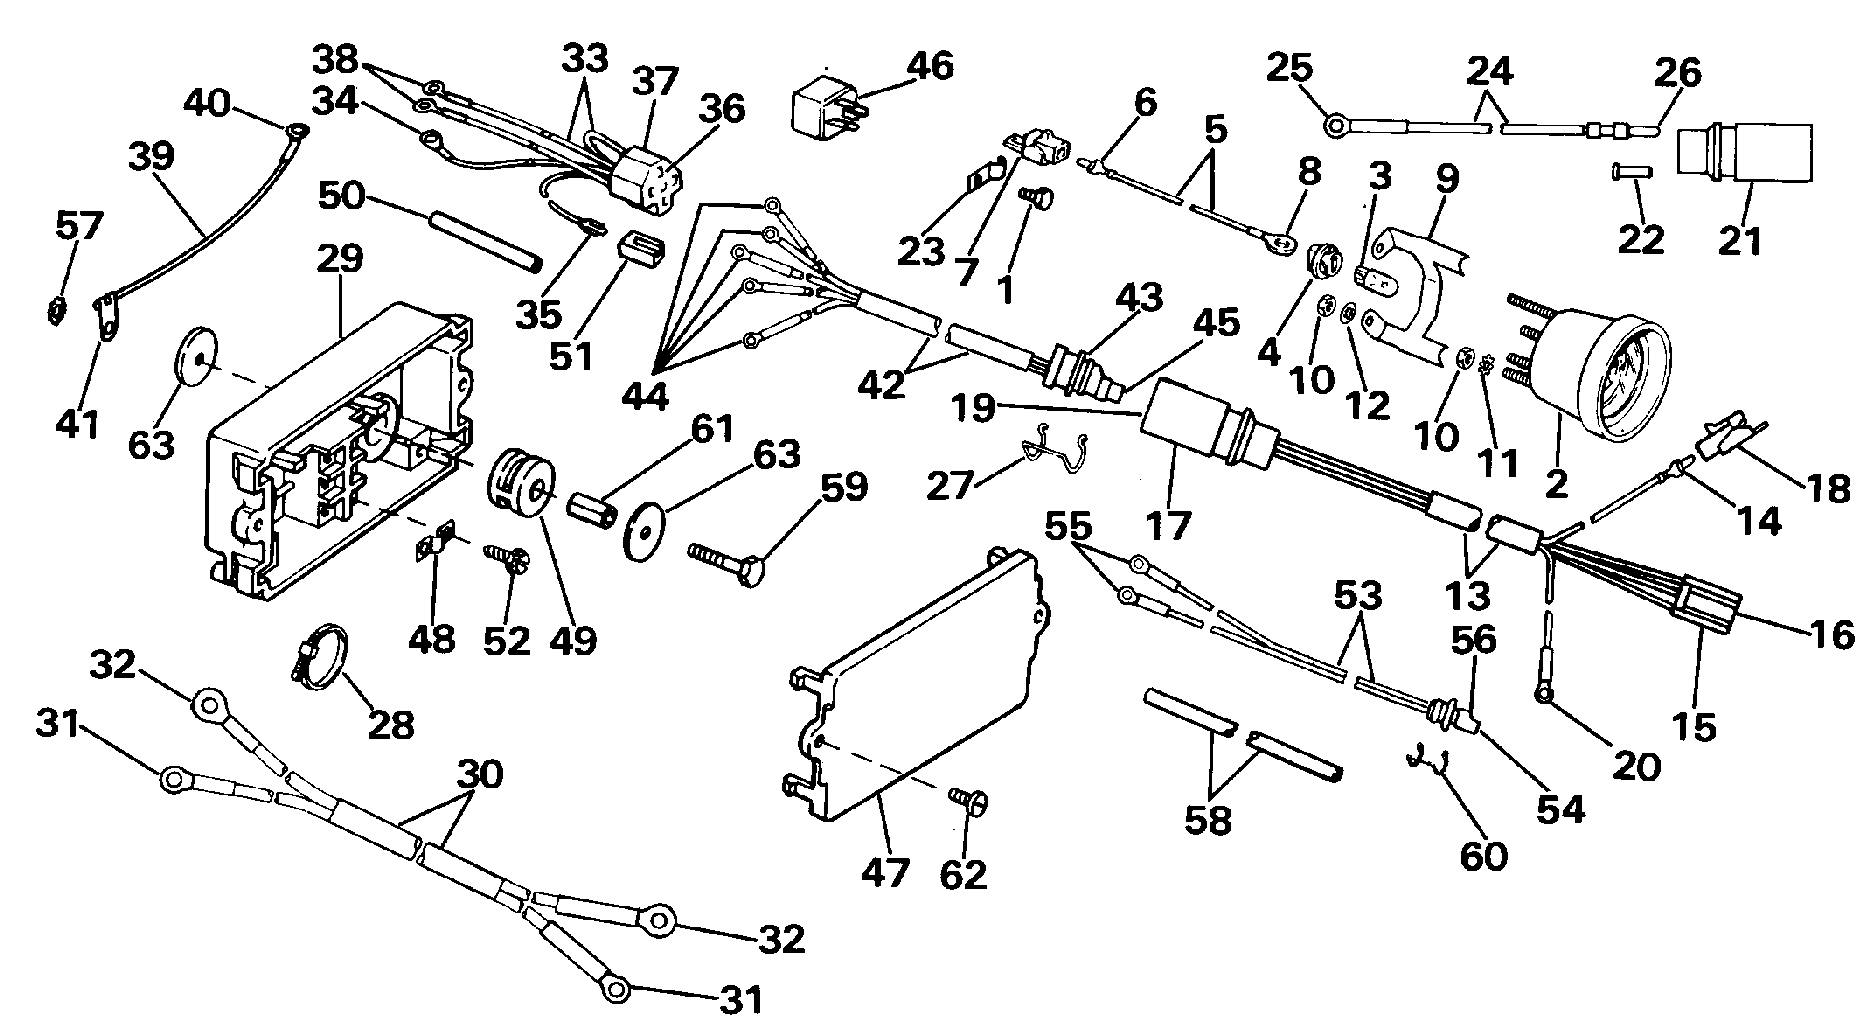 5-PIN OMC 0512754 0512754 CONNECTOR